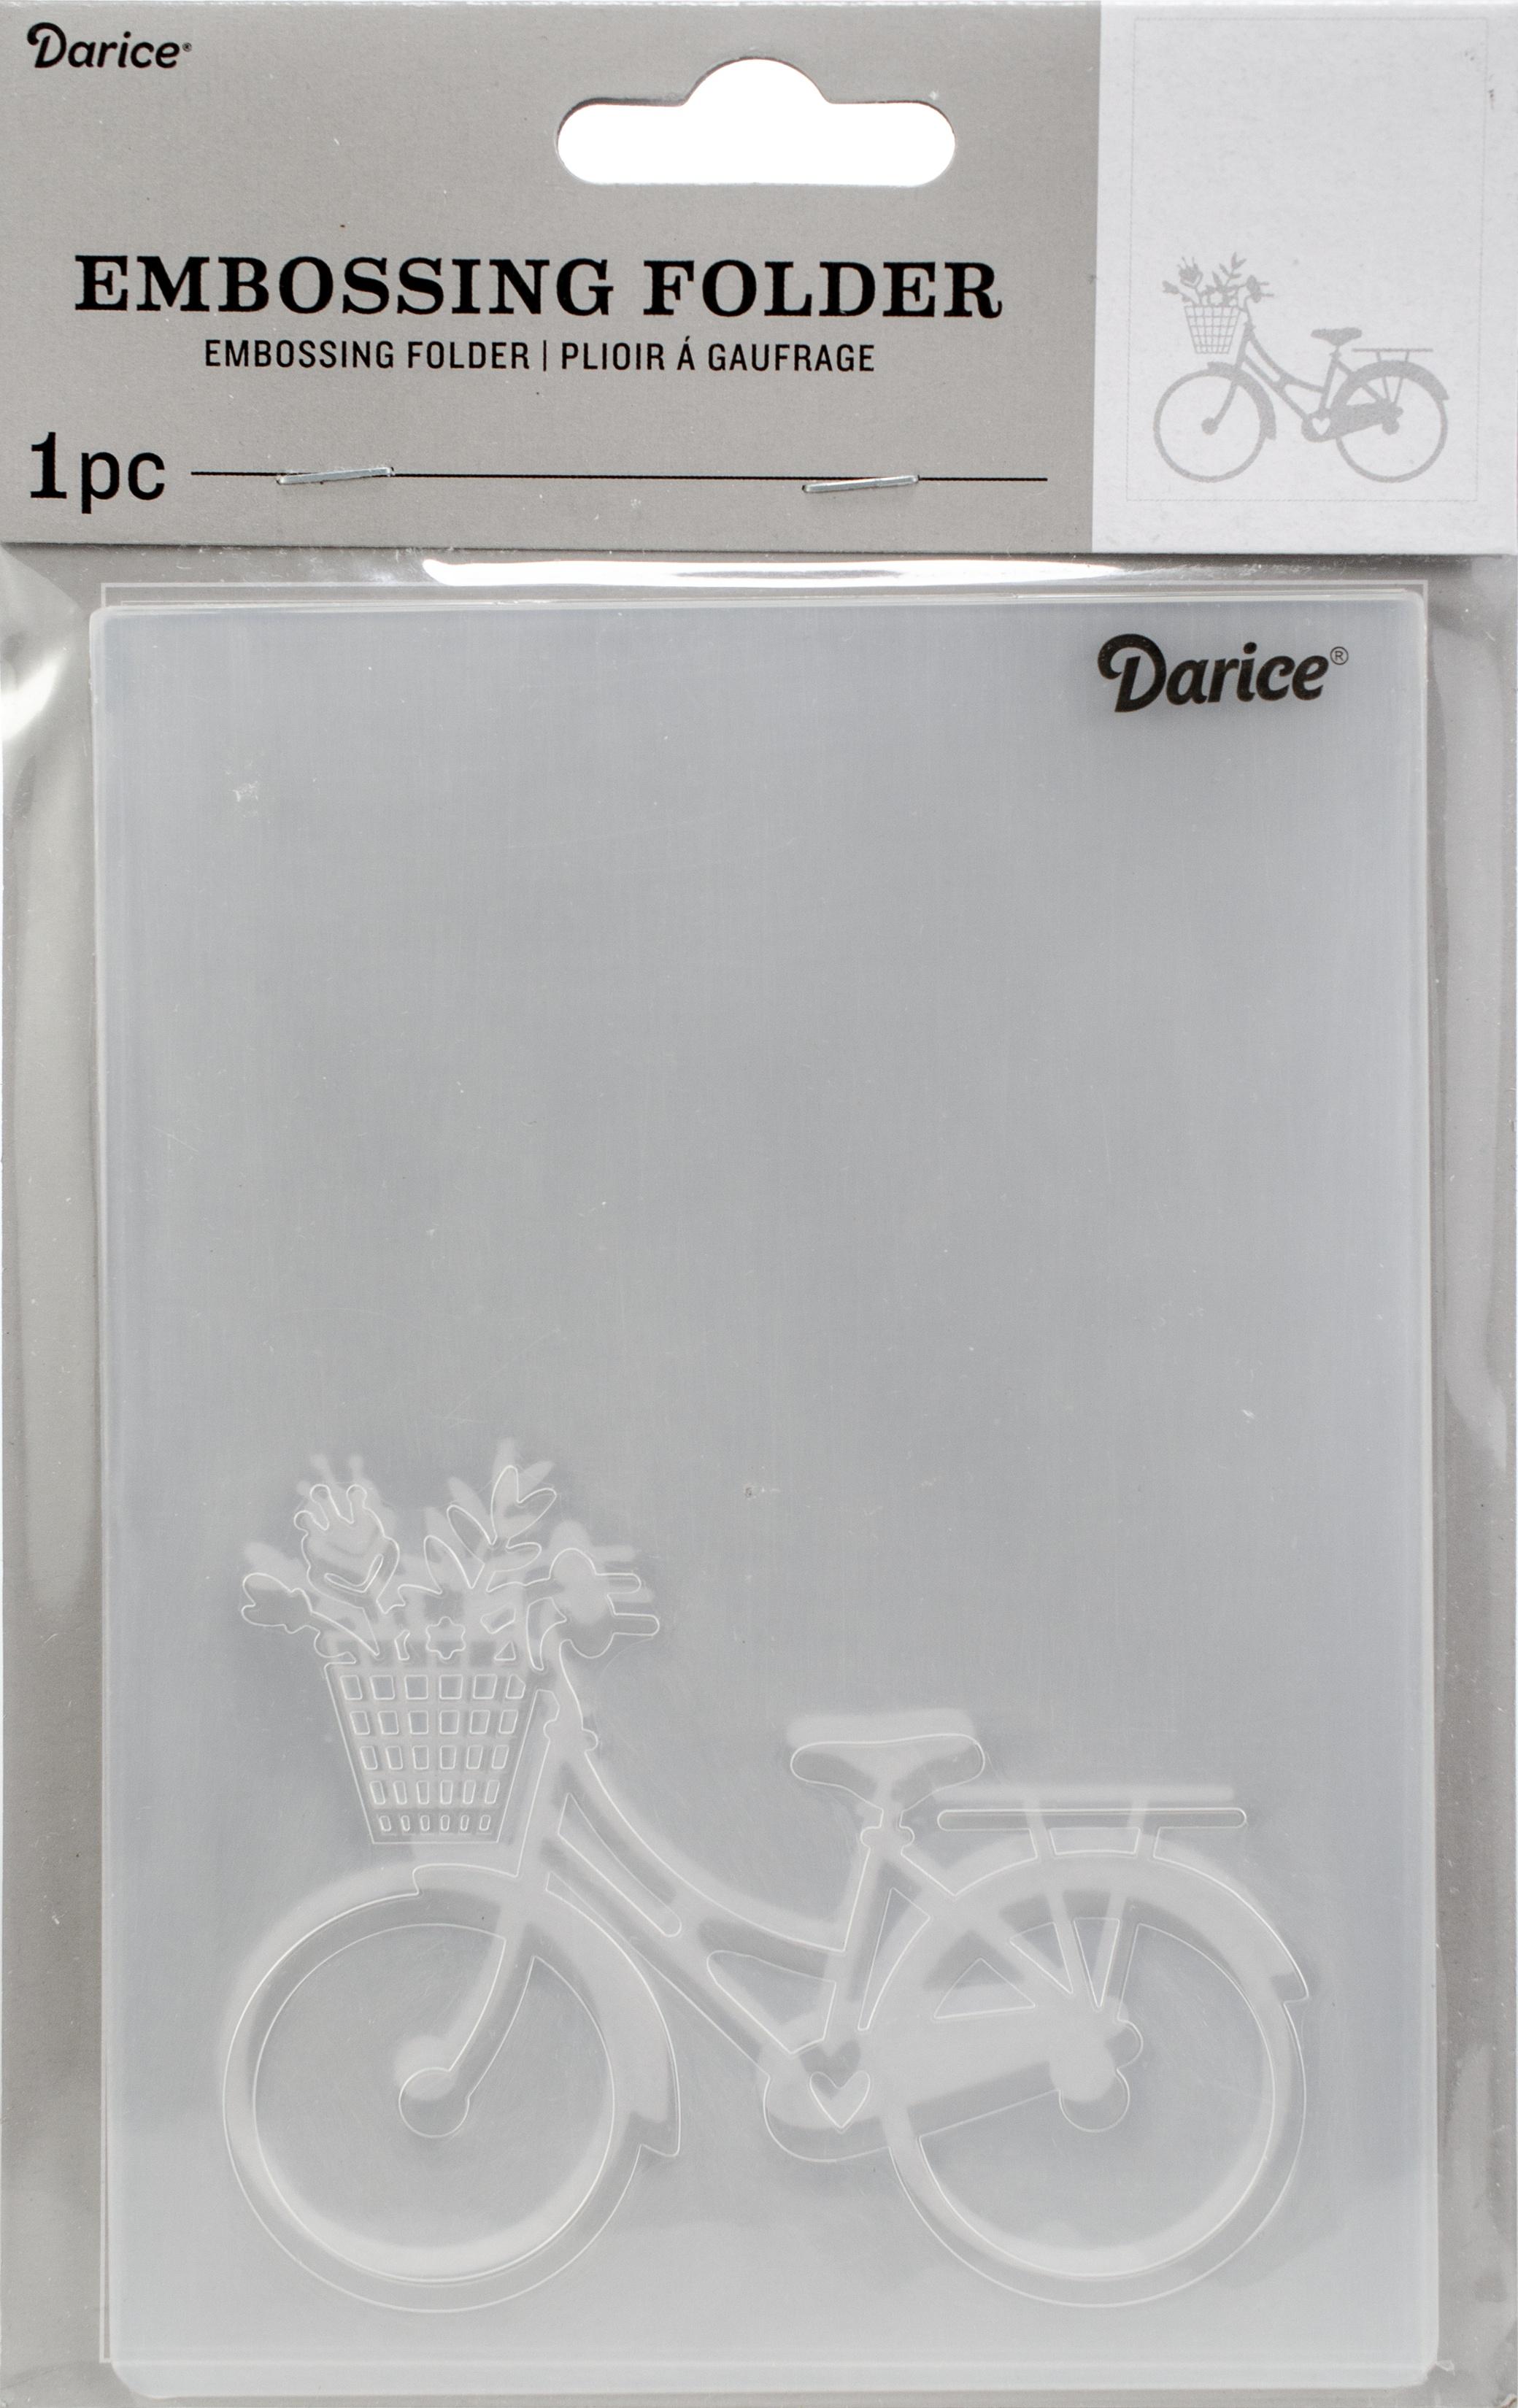 Darice bicycle folder